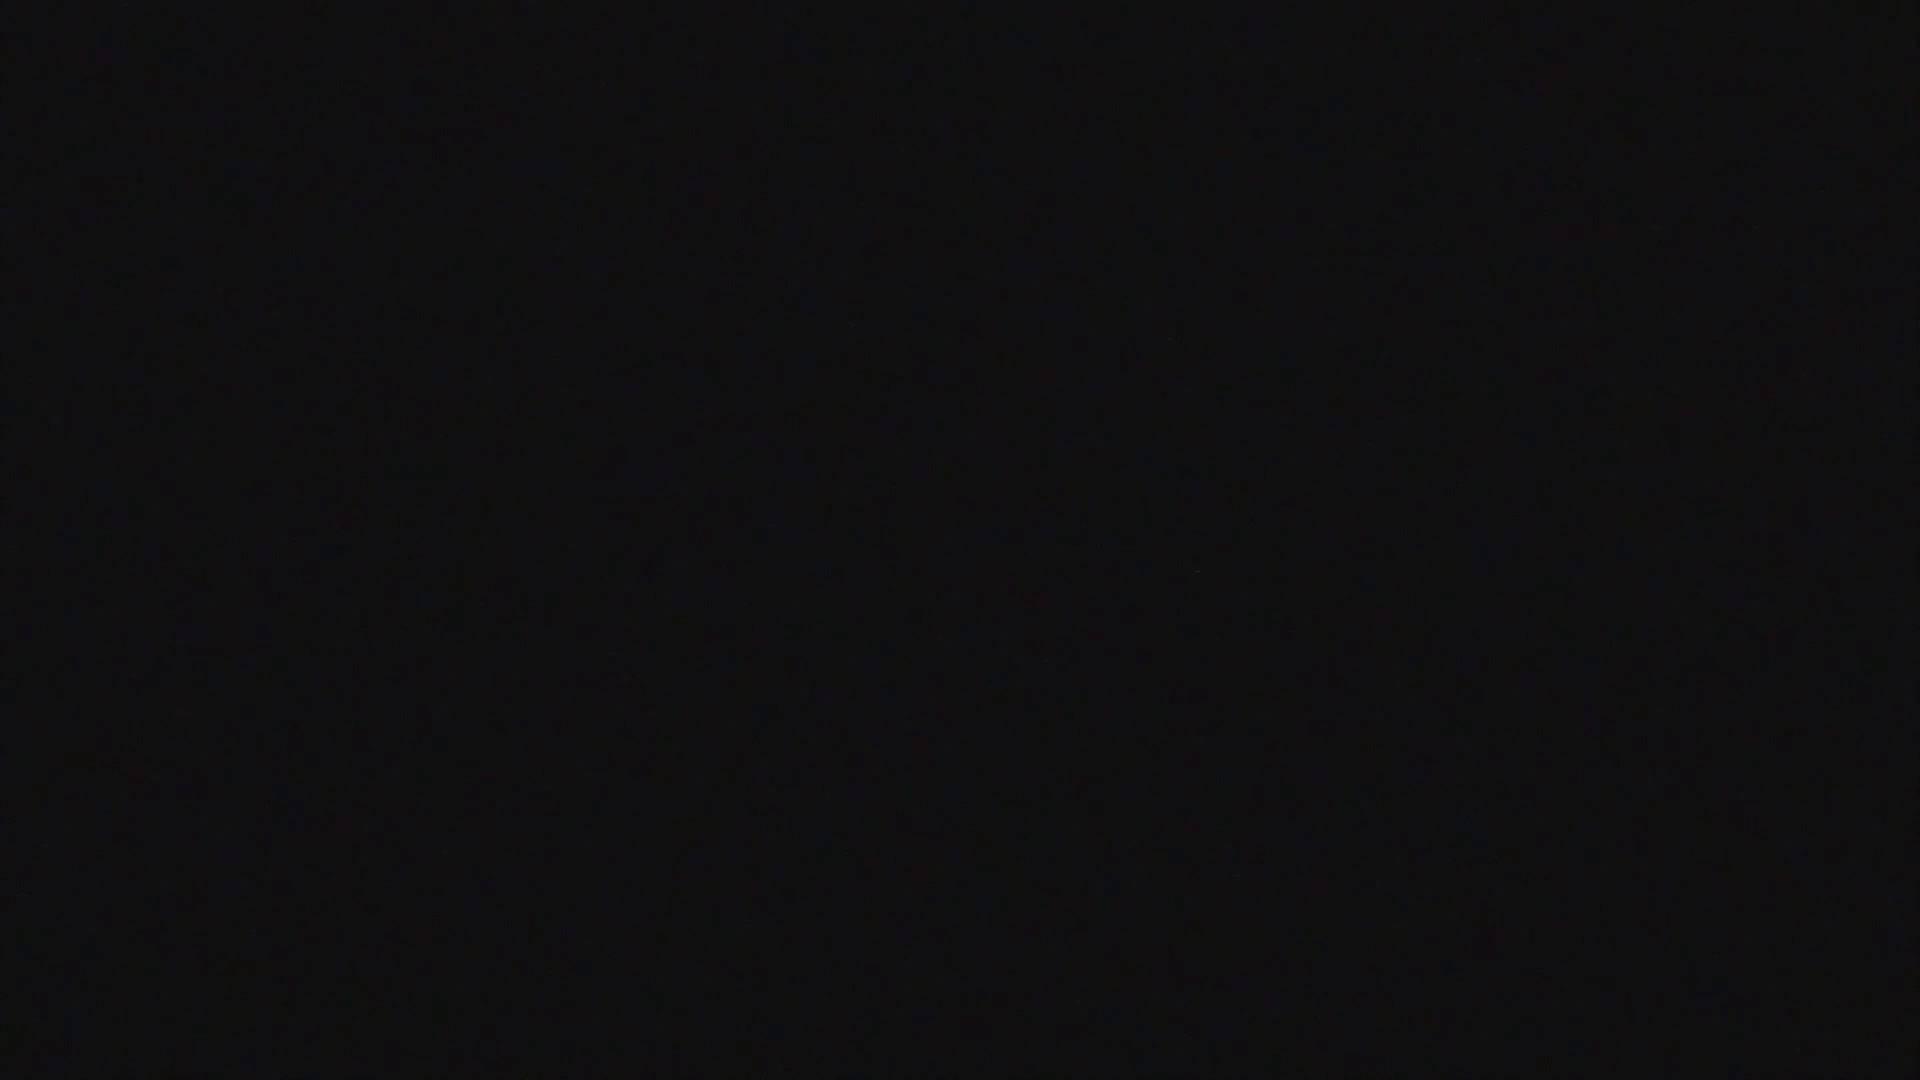 Kel-Tec PMR-30 Low Light Muzzle Flash